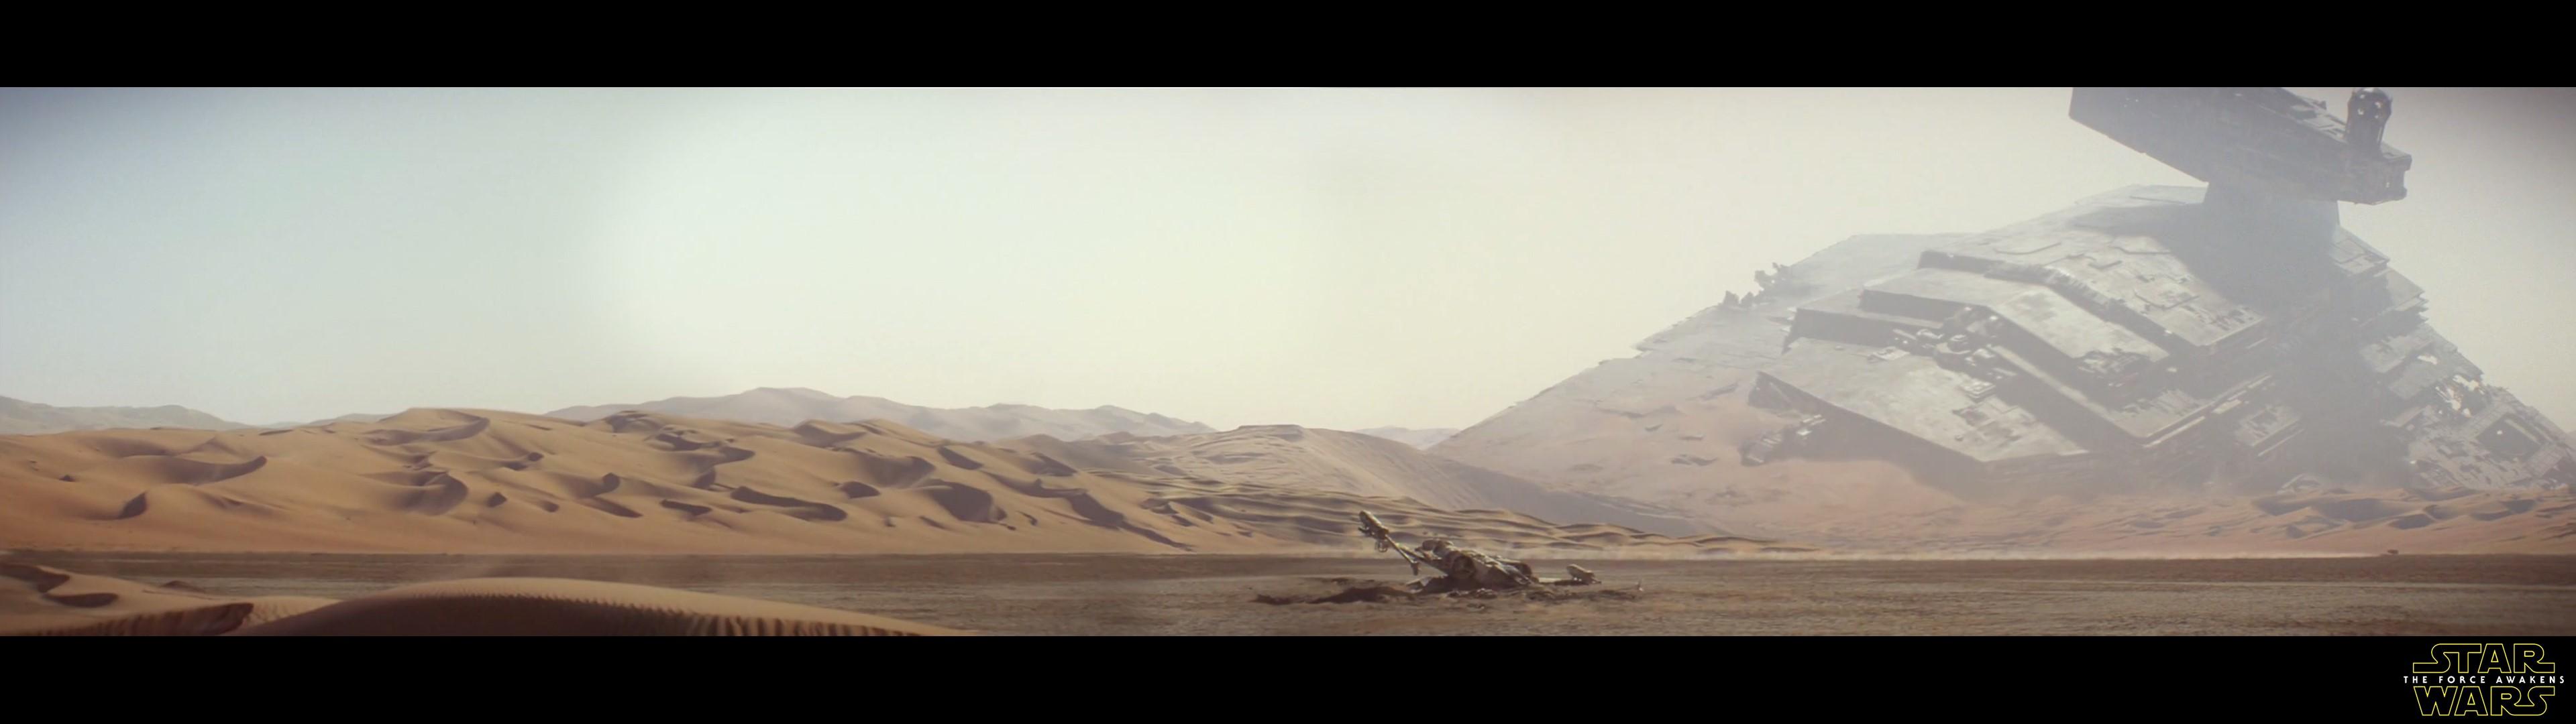 Full Screen HD Wallpapers 67